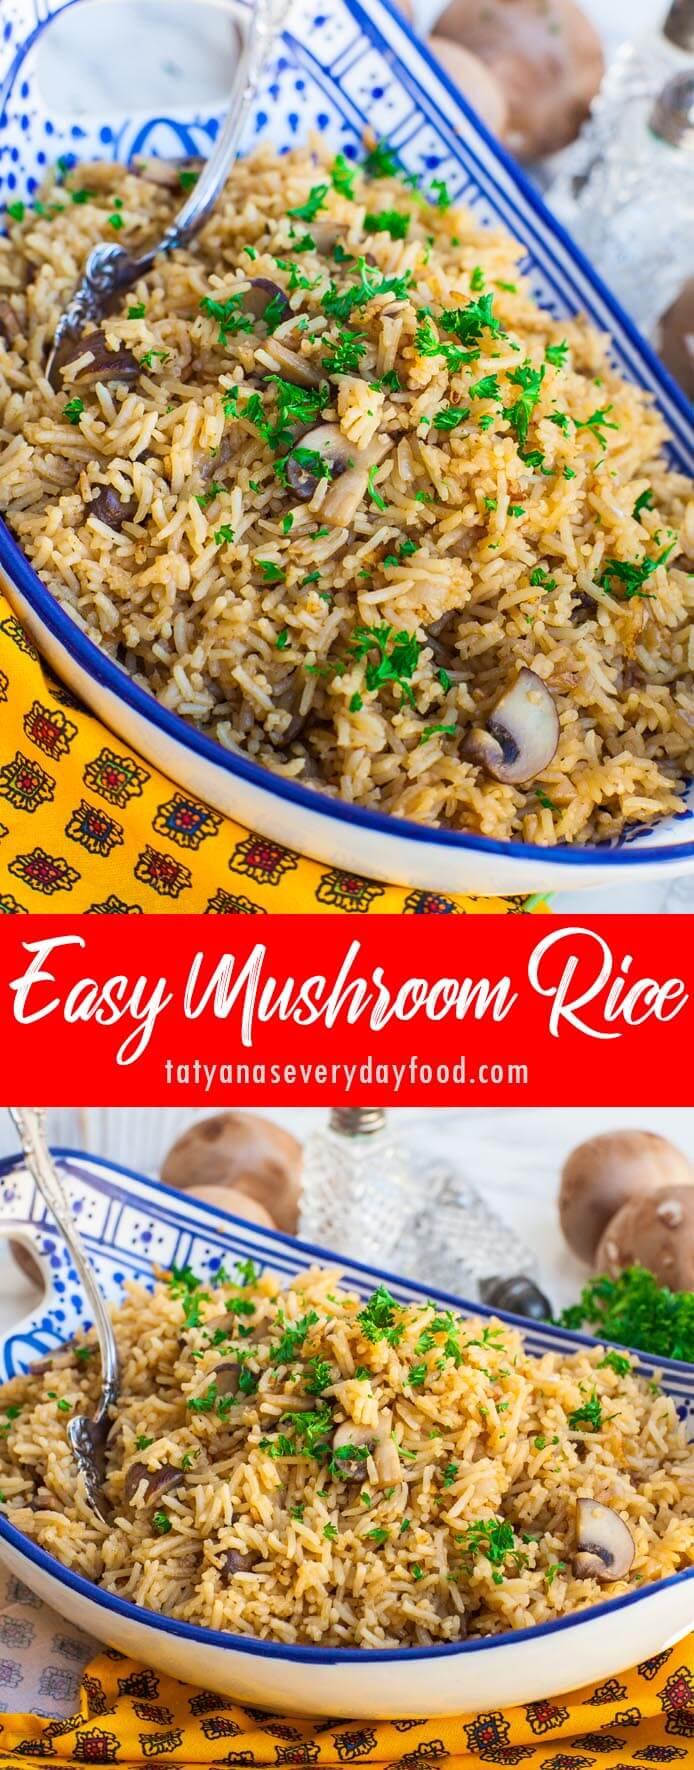 Easy Mushroom Rice video recipe